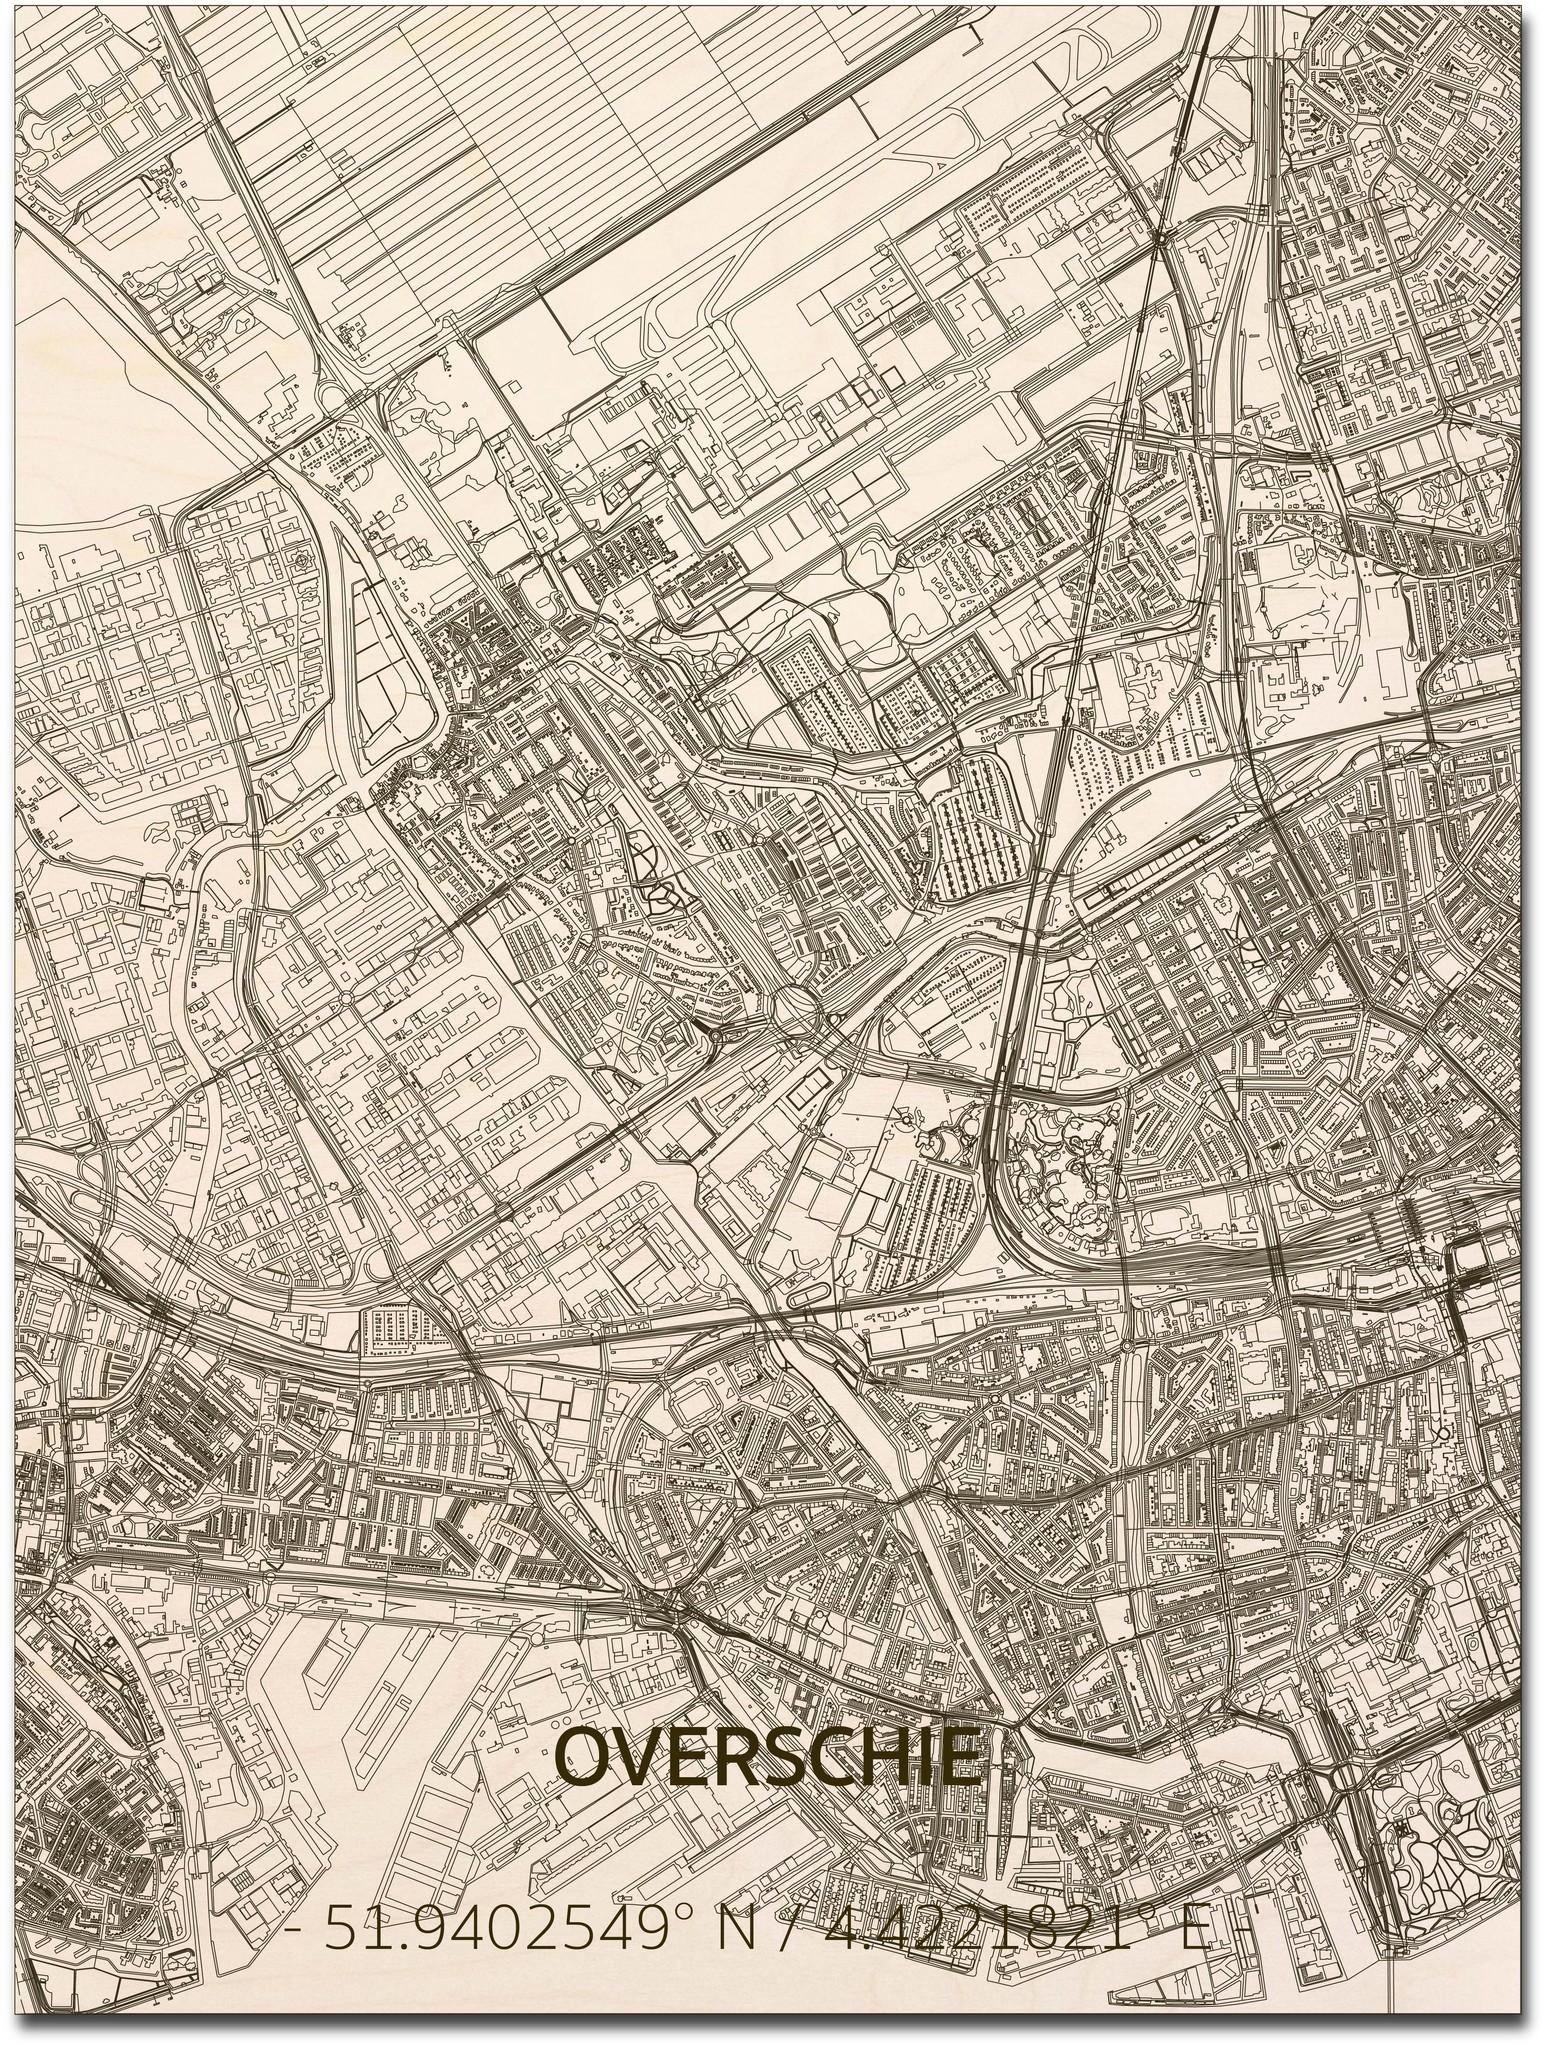 Stadtplan Overschie | Wanddekoration Holz-1